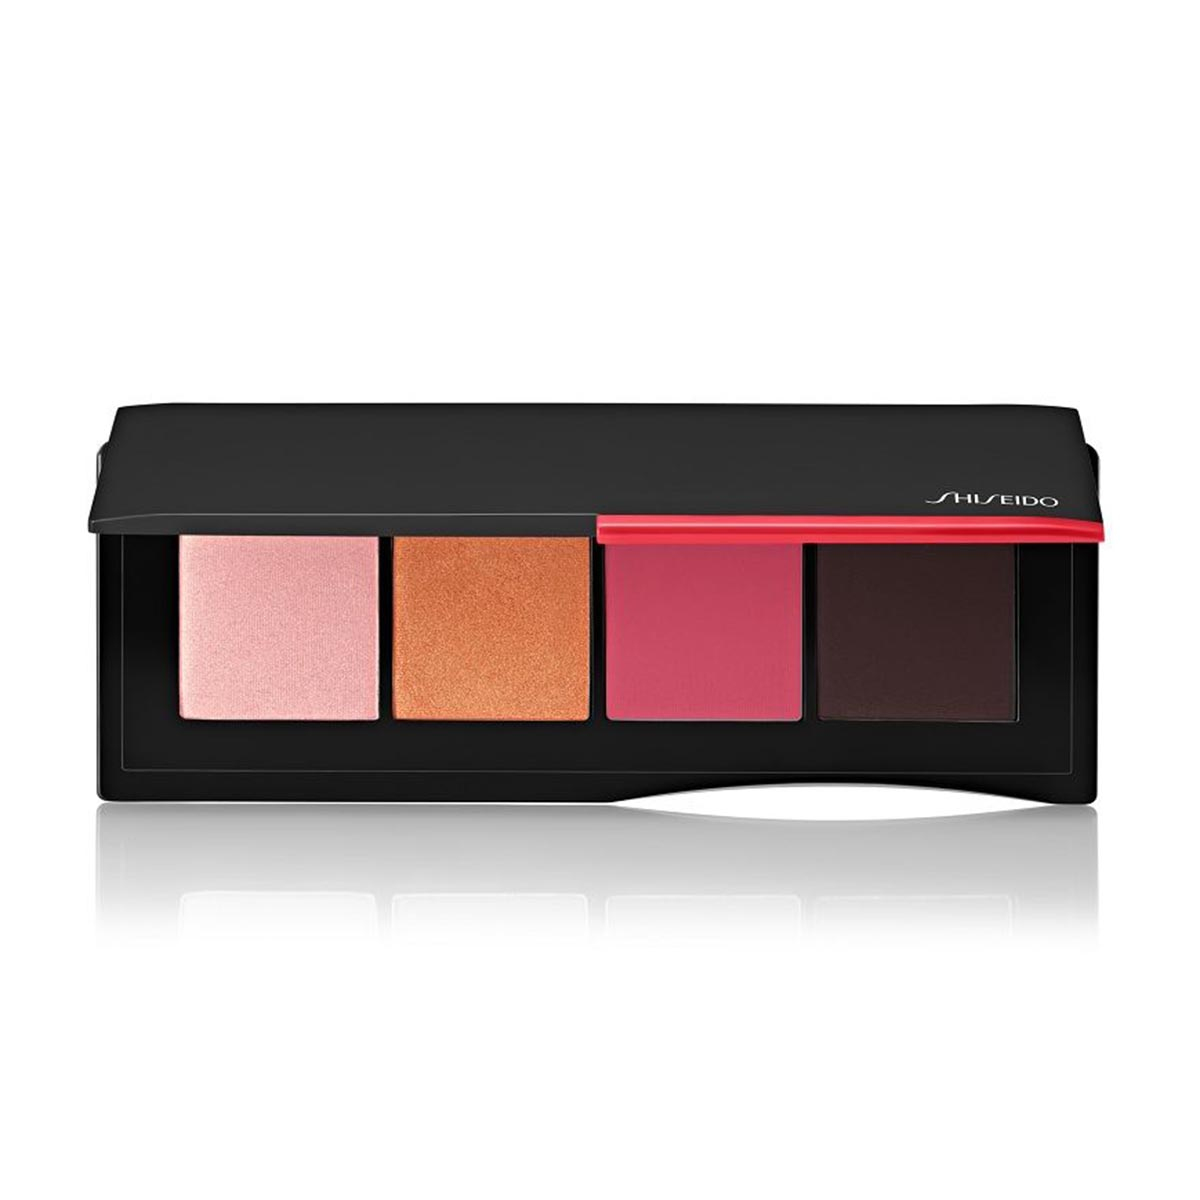 Shiseido essentialist eye palette 08